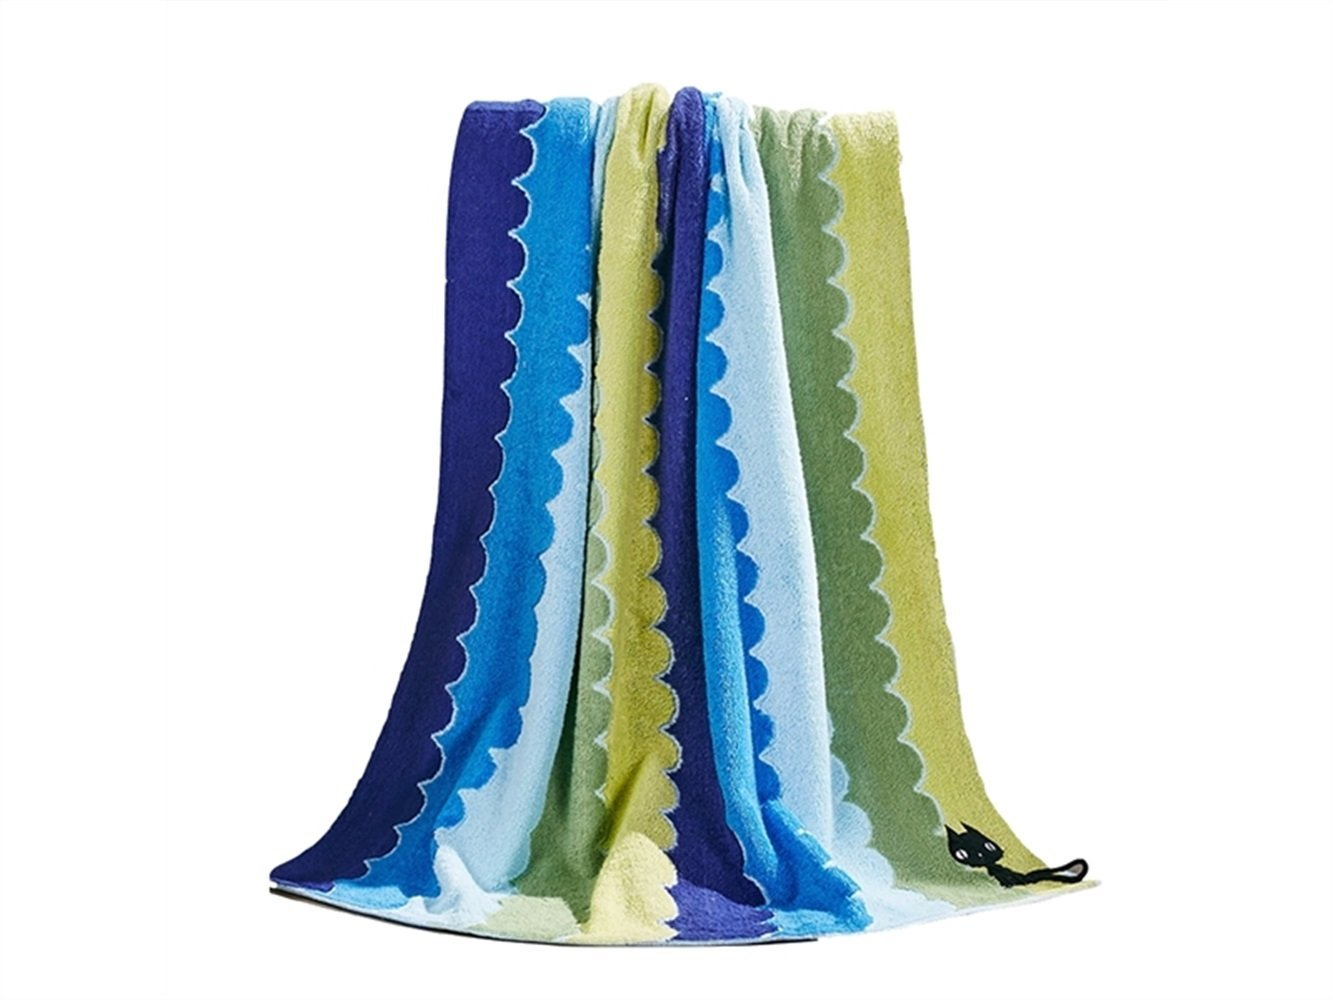 Wesource Activates Cartoon Stripe Cat Cotton Adult Bath Towel Soft Absorbent Couple Wash Bath Towel Household (Blue)